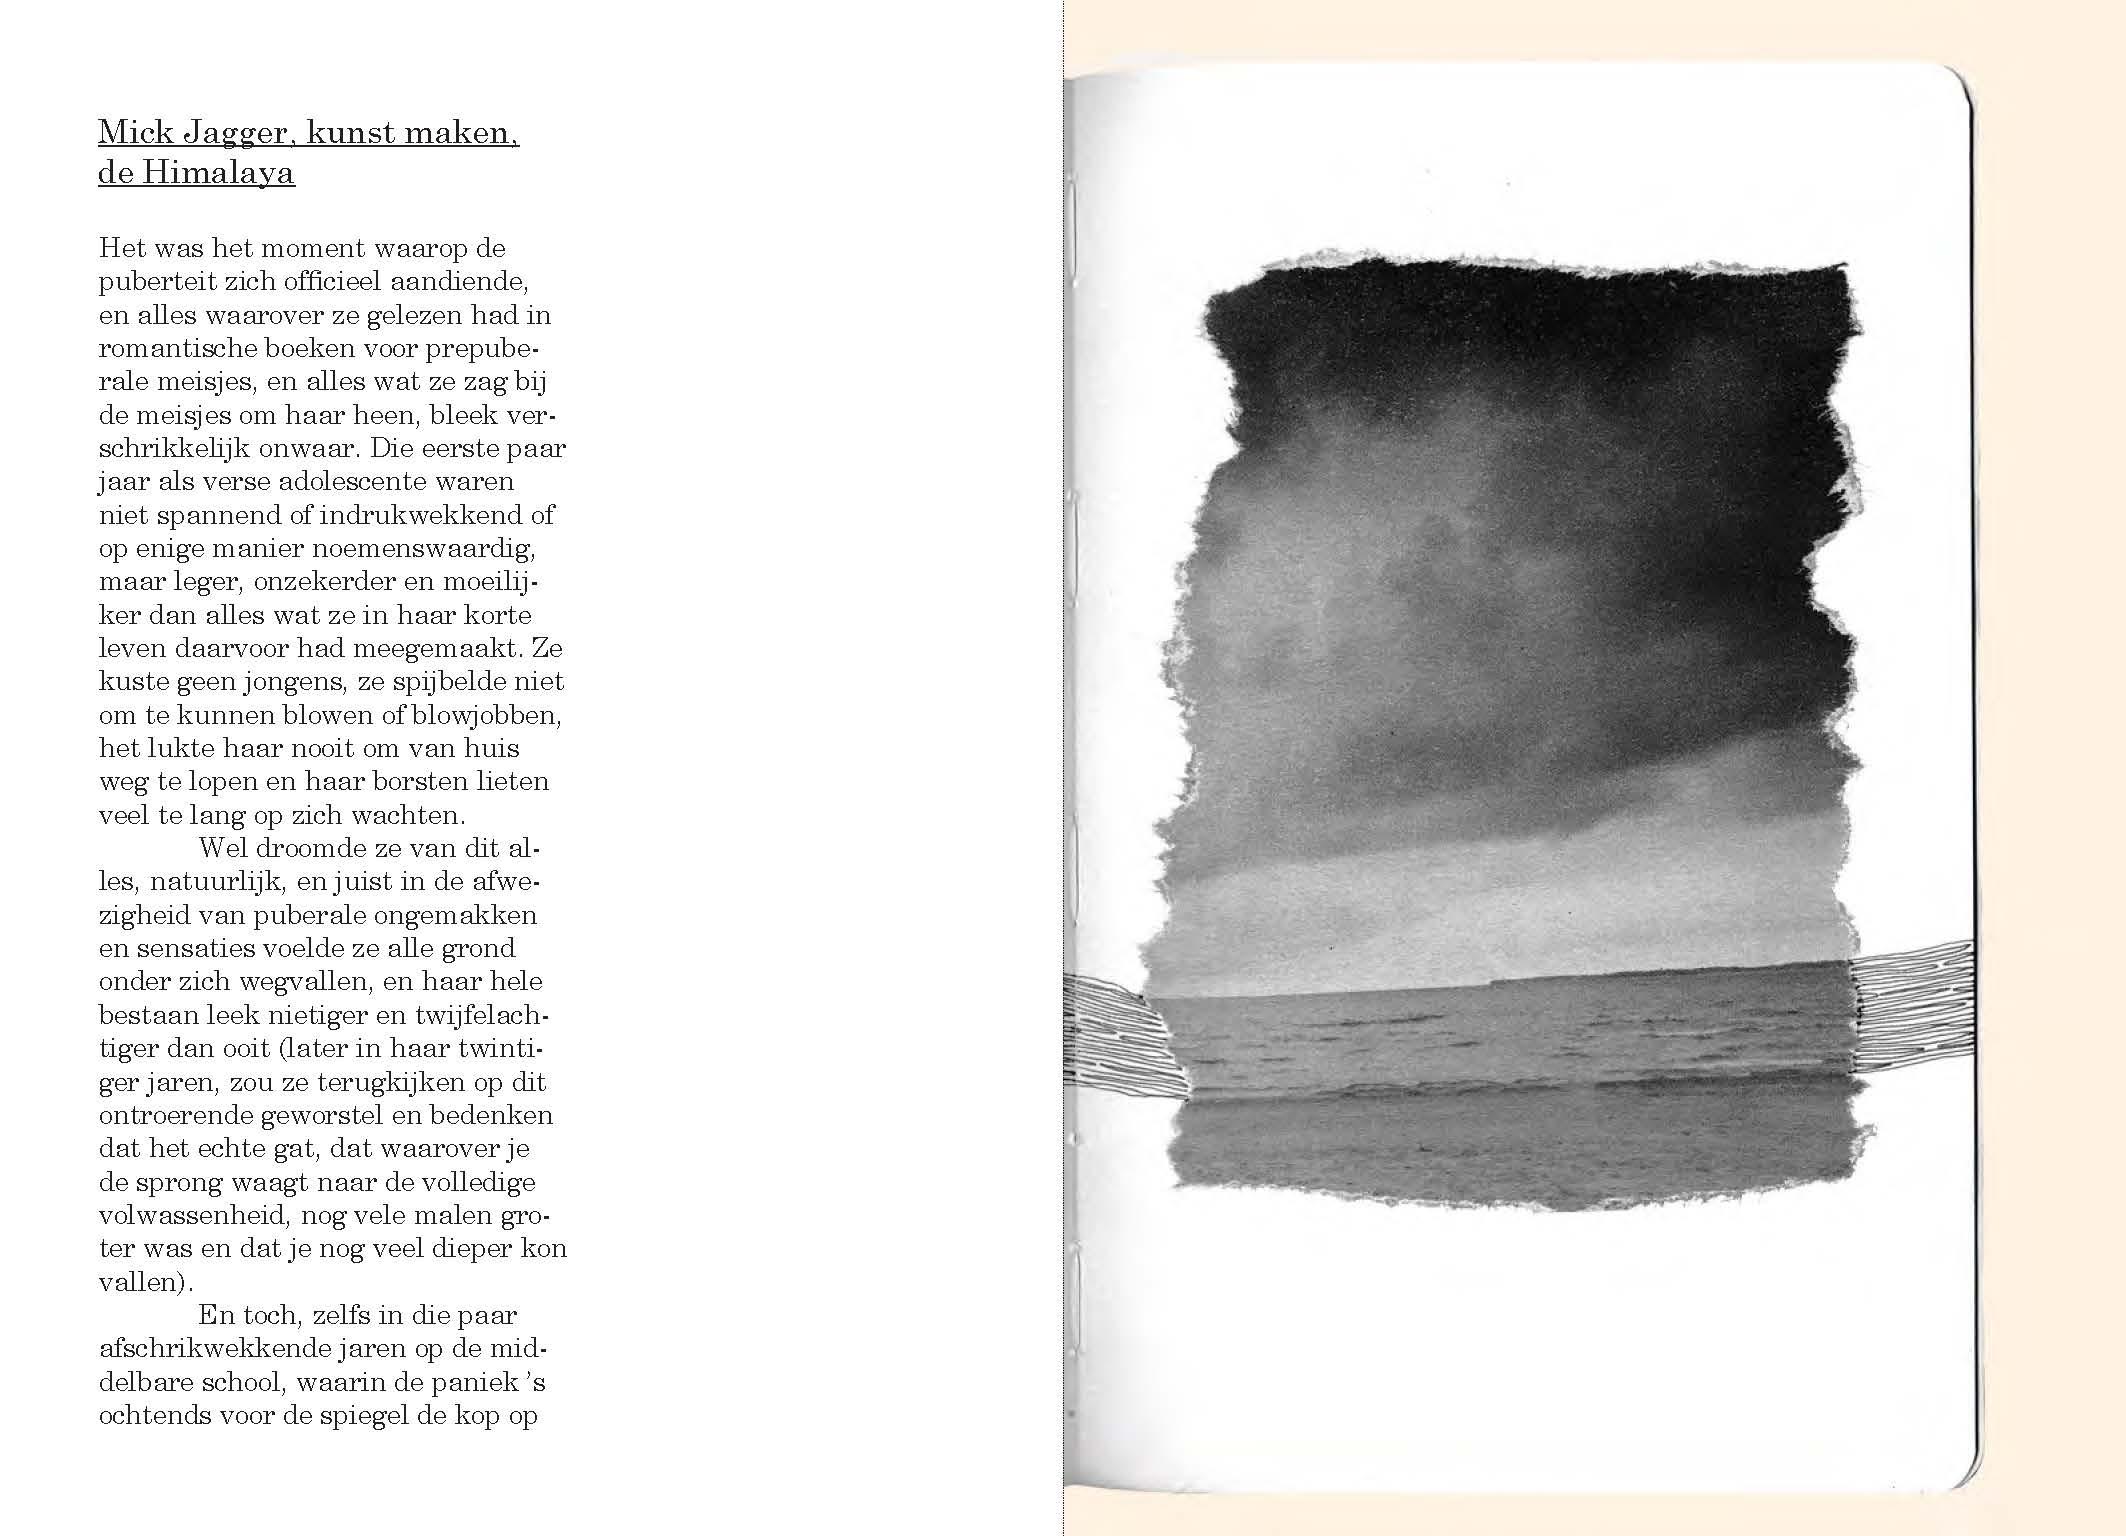 Manuscript-Selfie-YildauterBeek-Lang_Pagina_37.jpg